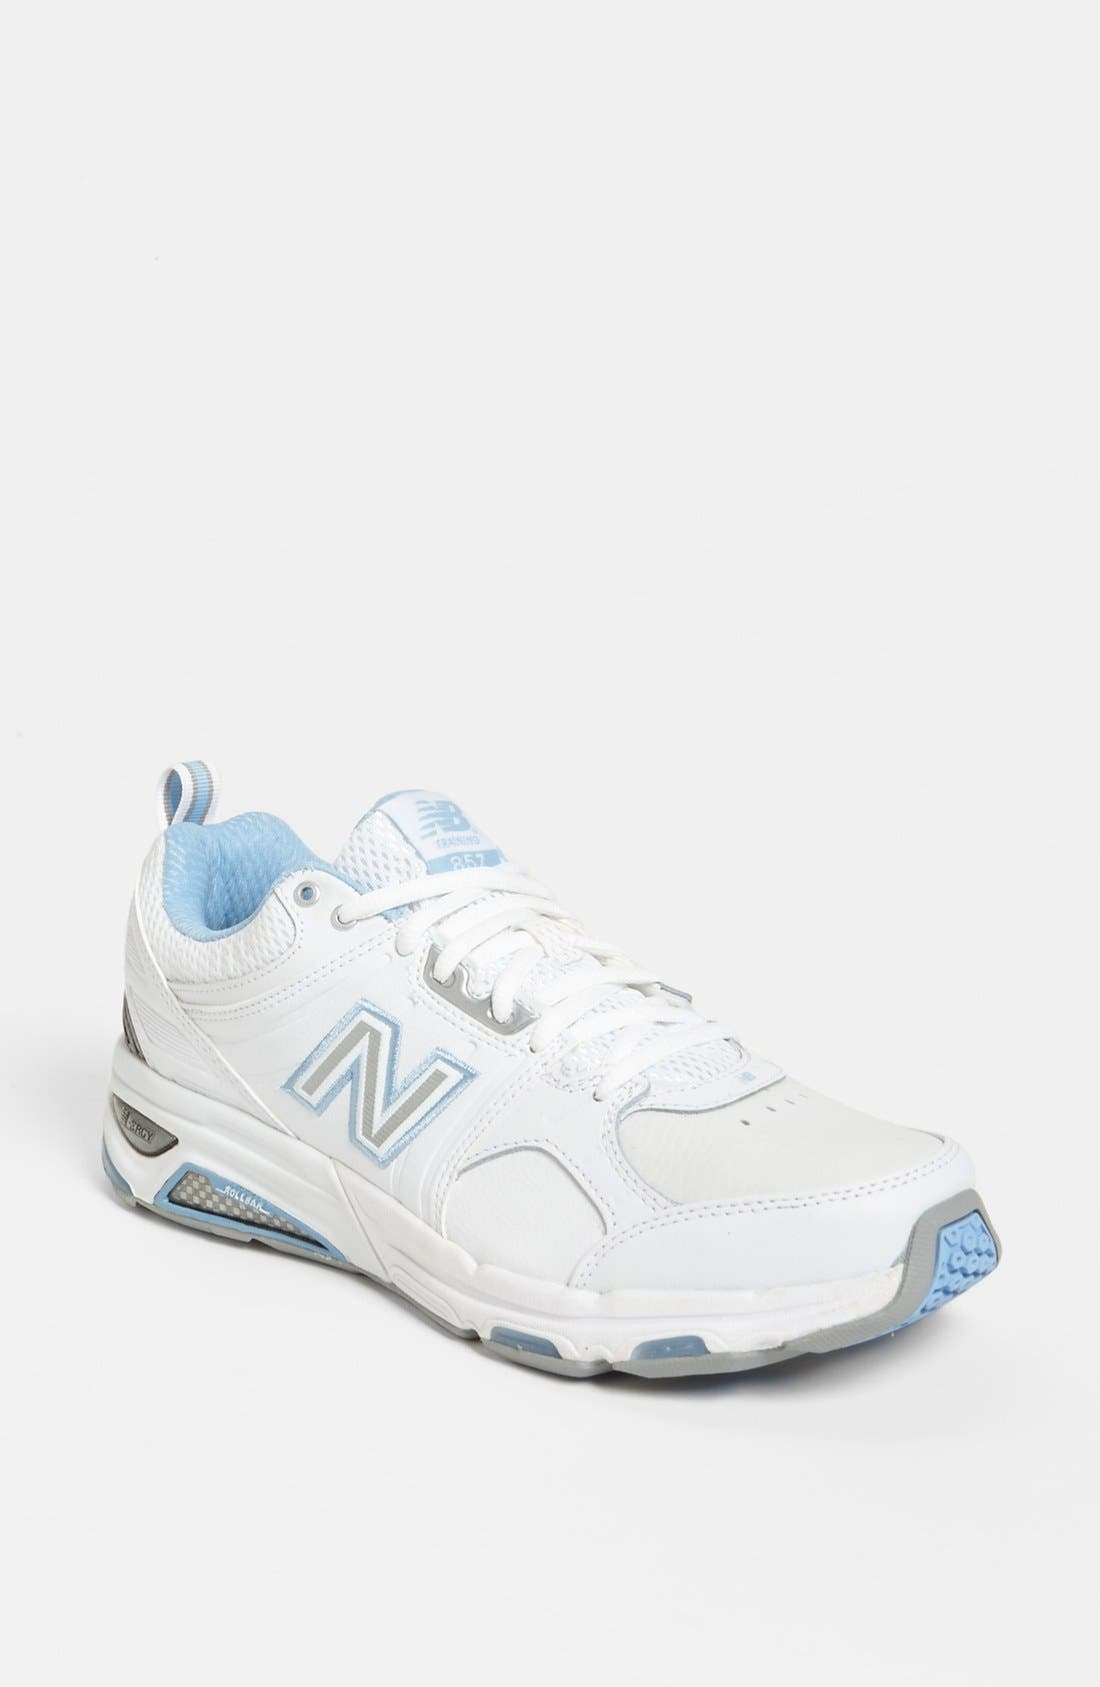 Main Image - New Balance '857' Training Shoe (Women)